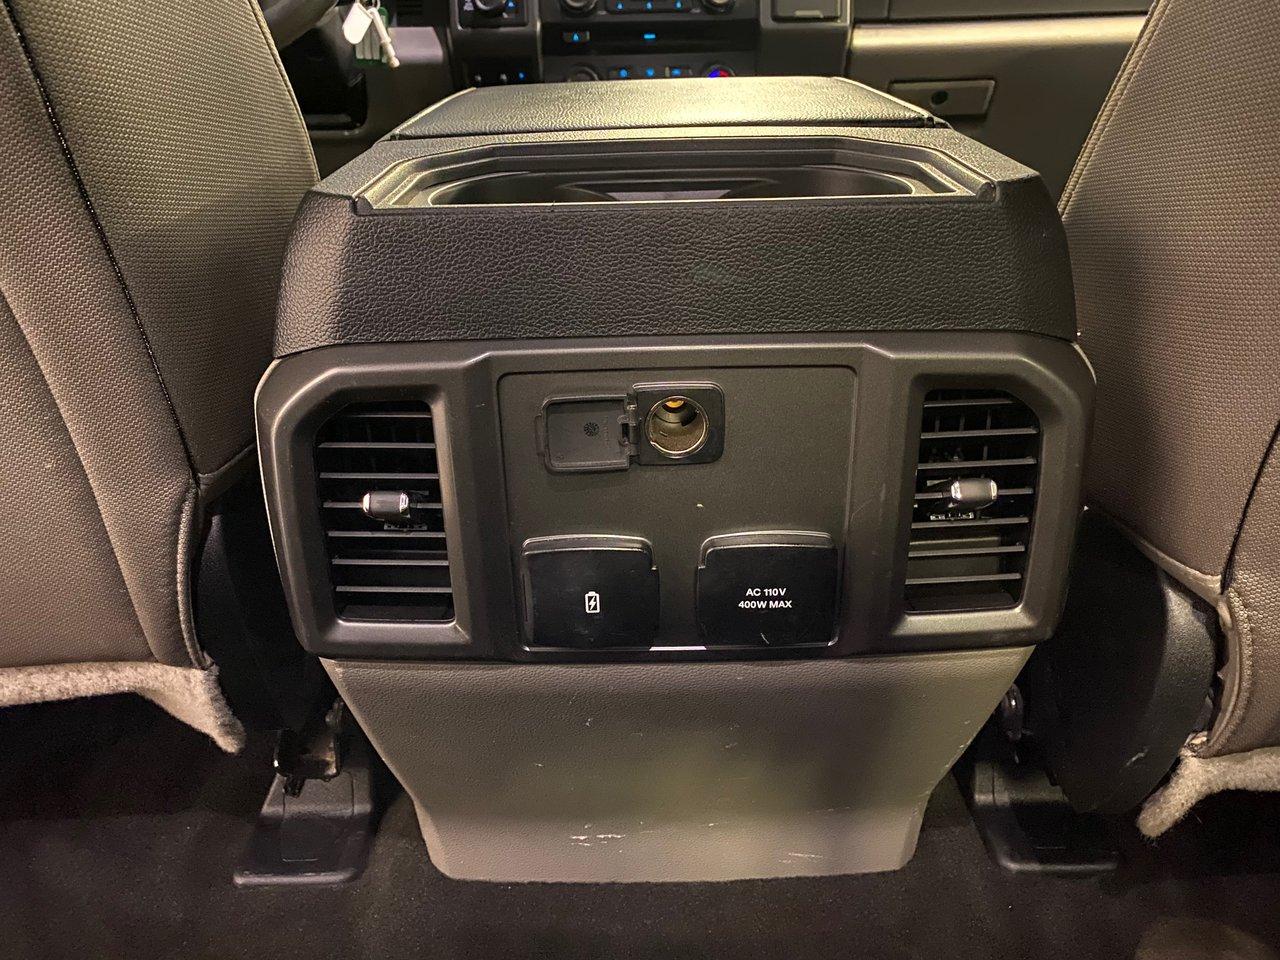 2018 Ford Super Duty F-250 SRW XLT 603A 4X4 6.7 DIESEL / JAMAIS ACCIDENTEE